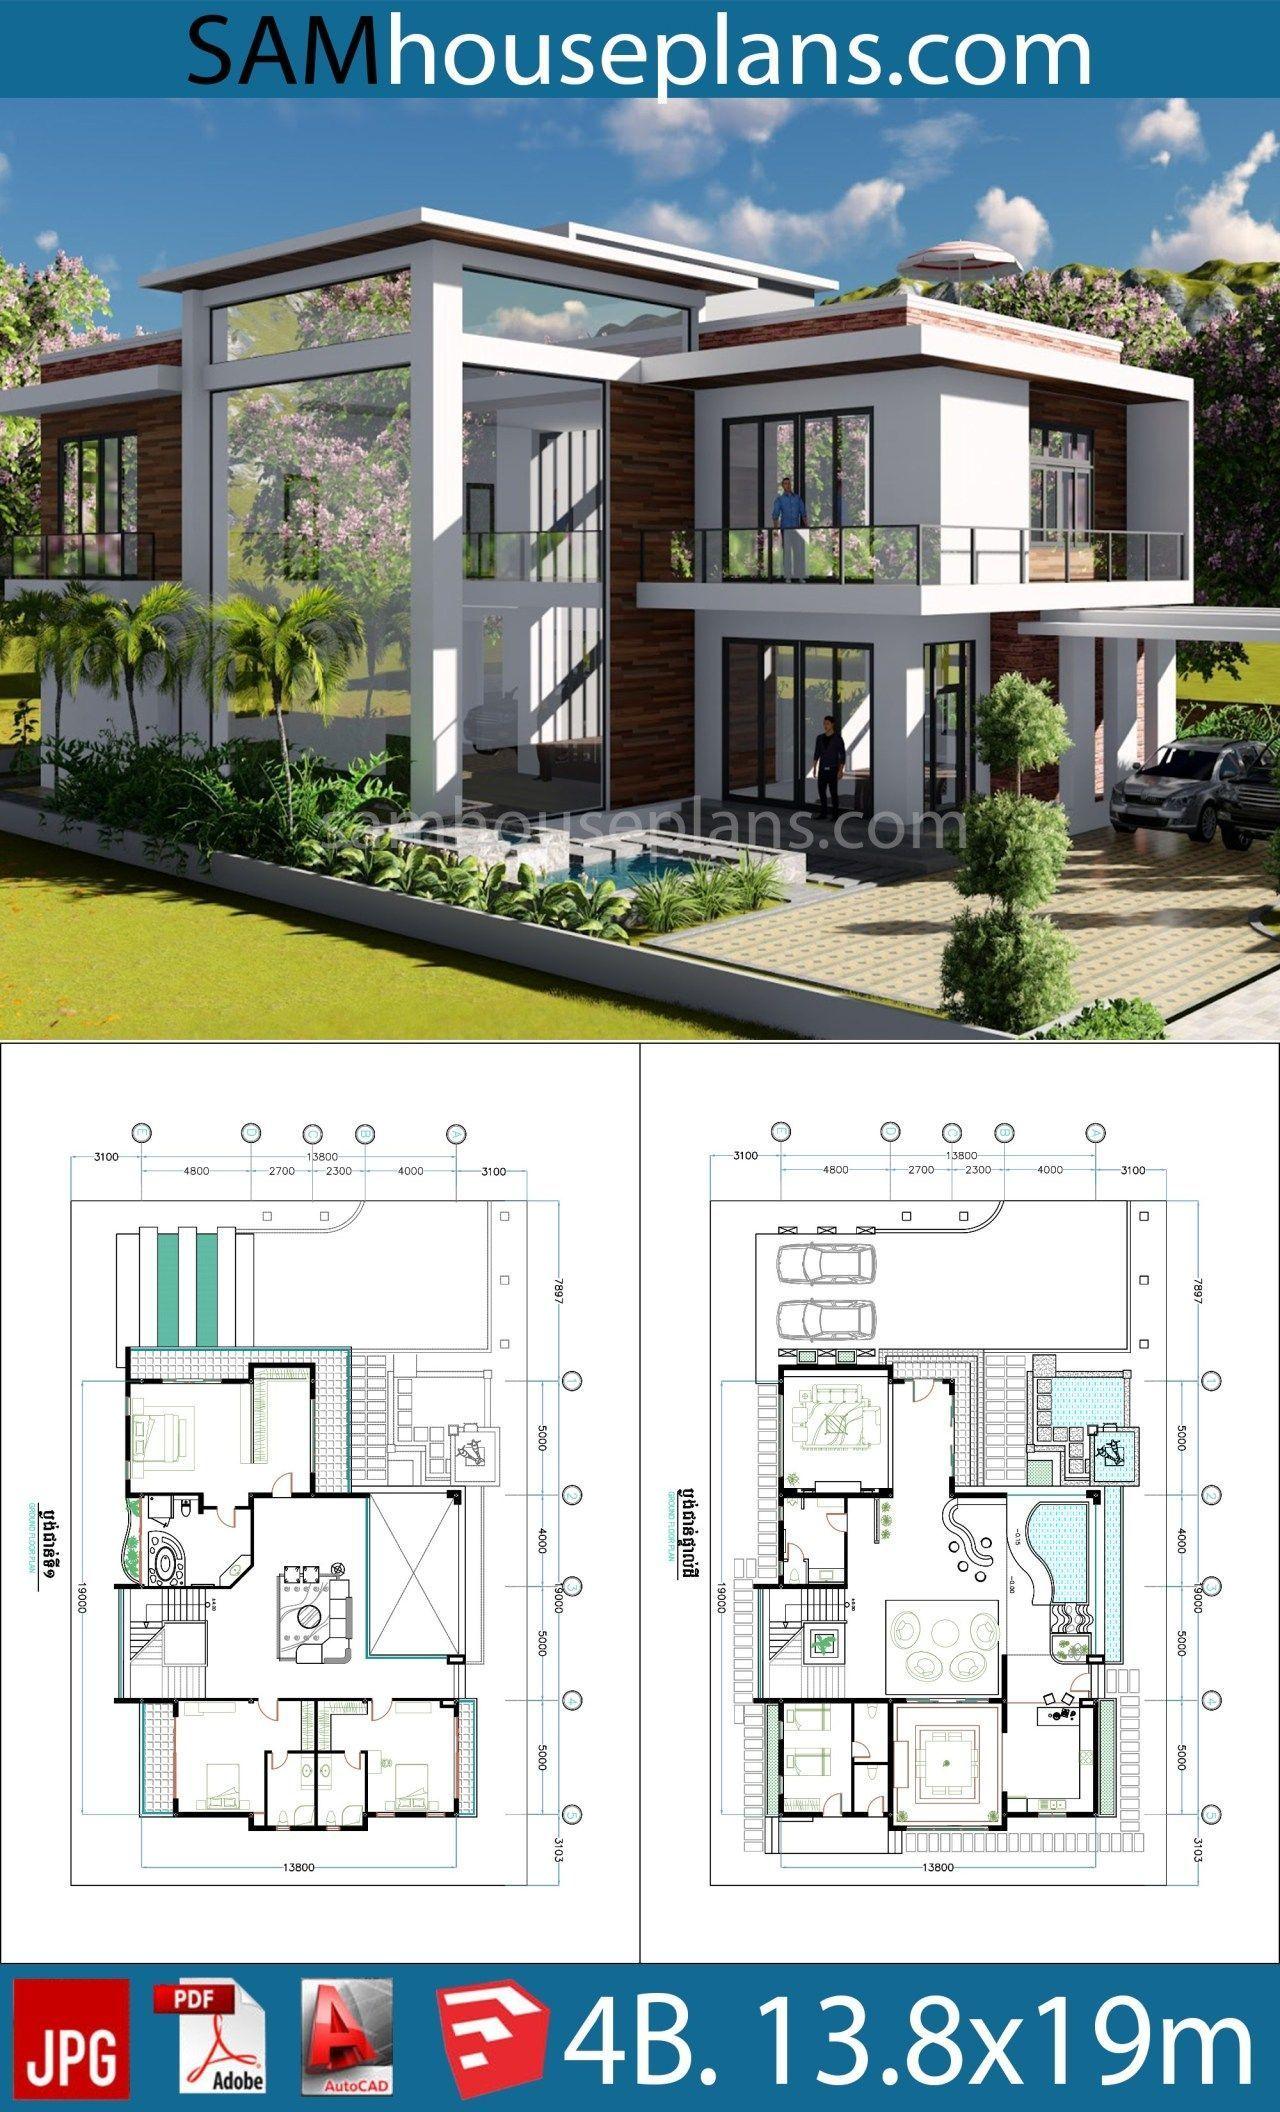 Pin On Luxurious House Beach House Plans Contemporary House Plans House Blueprints